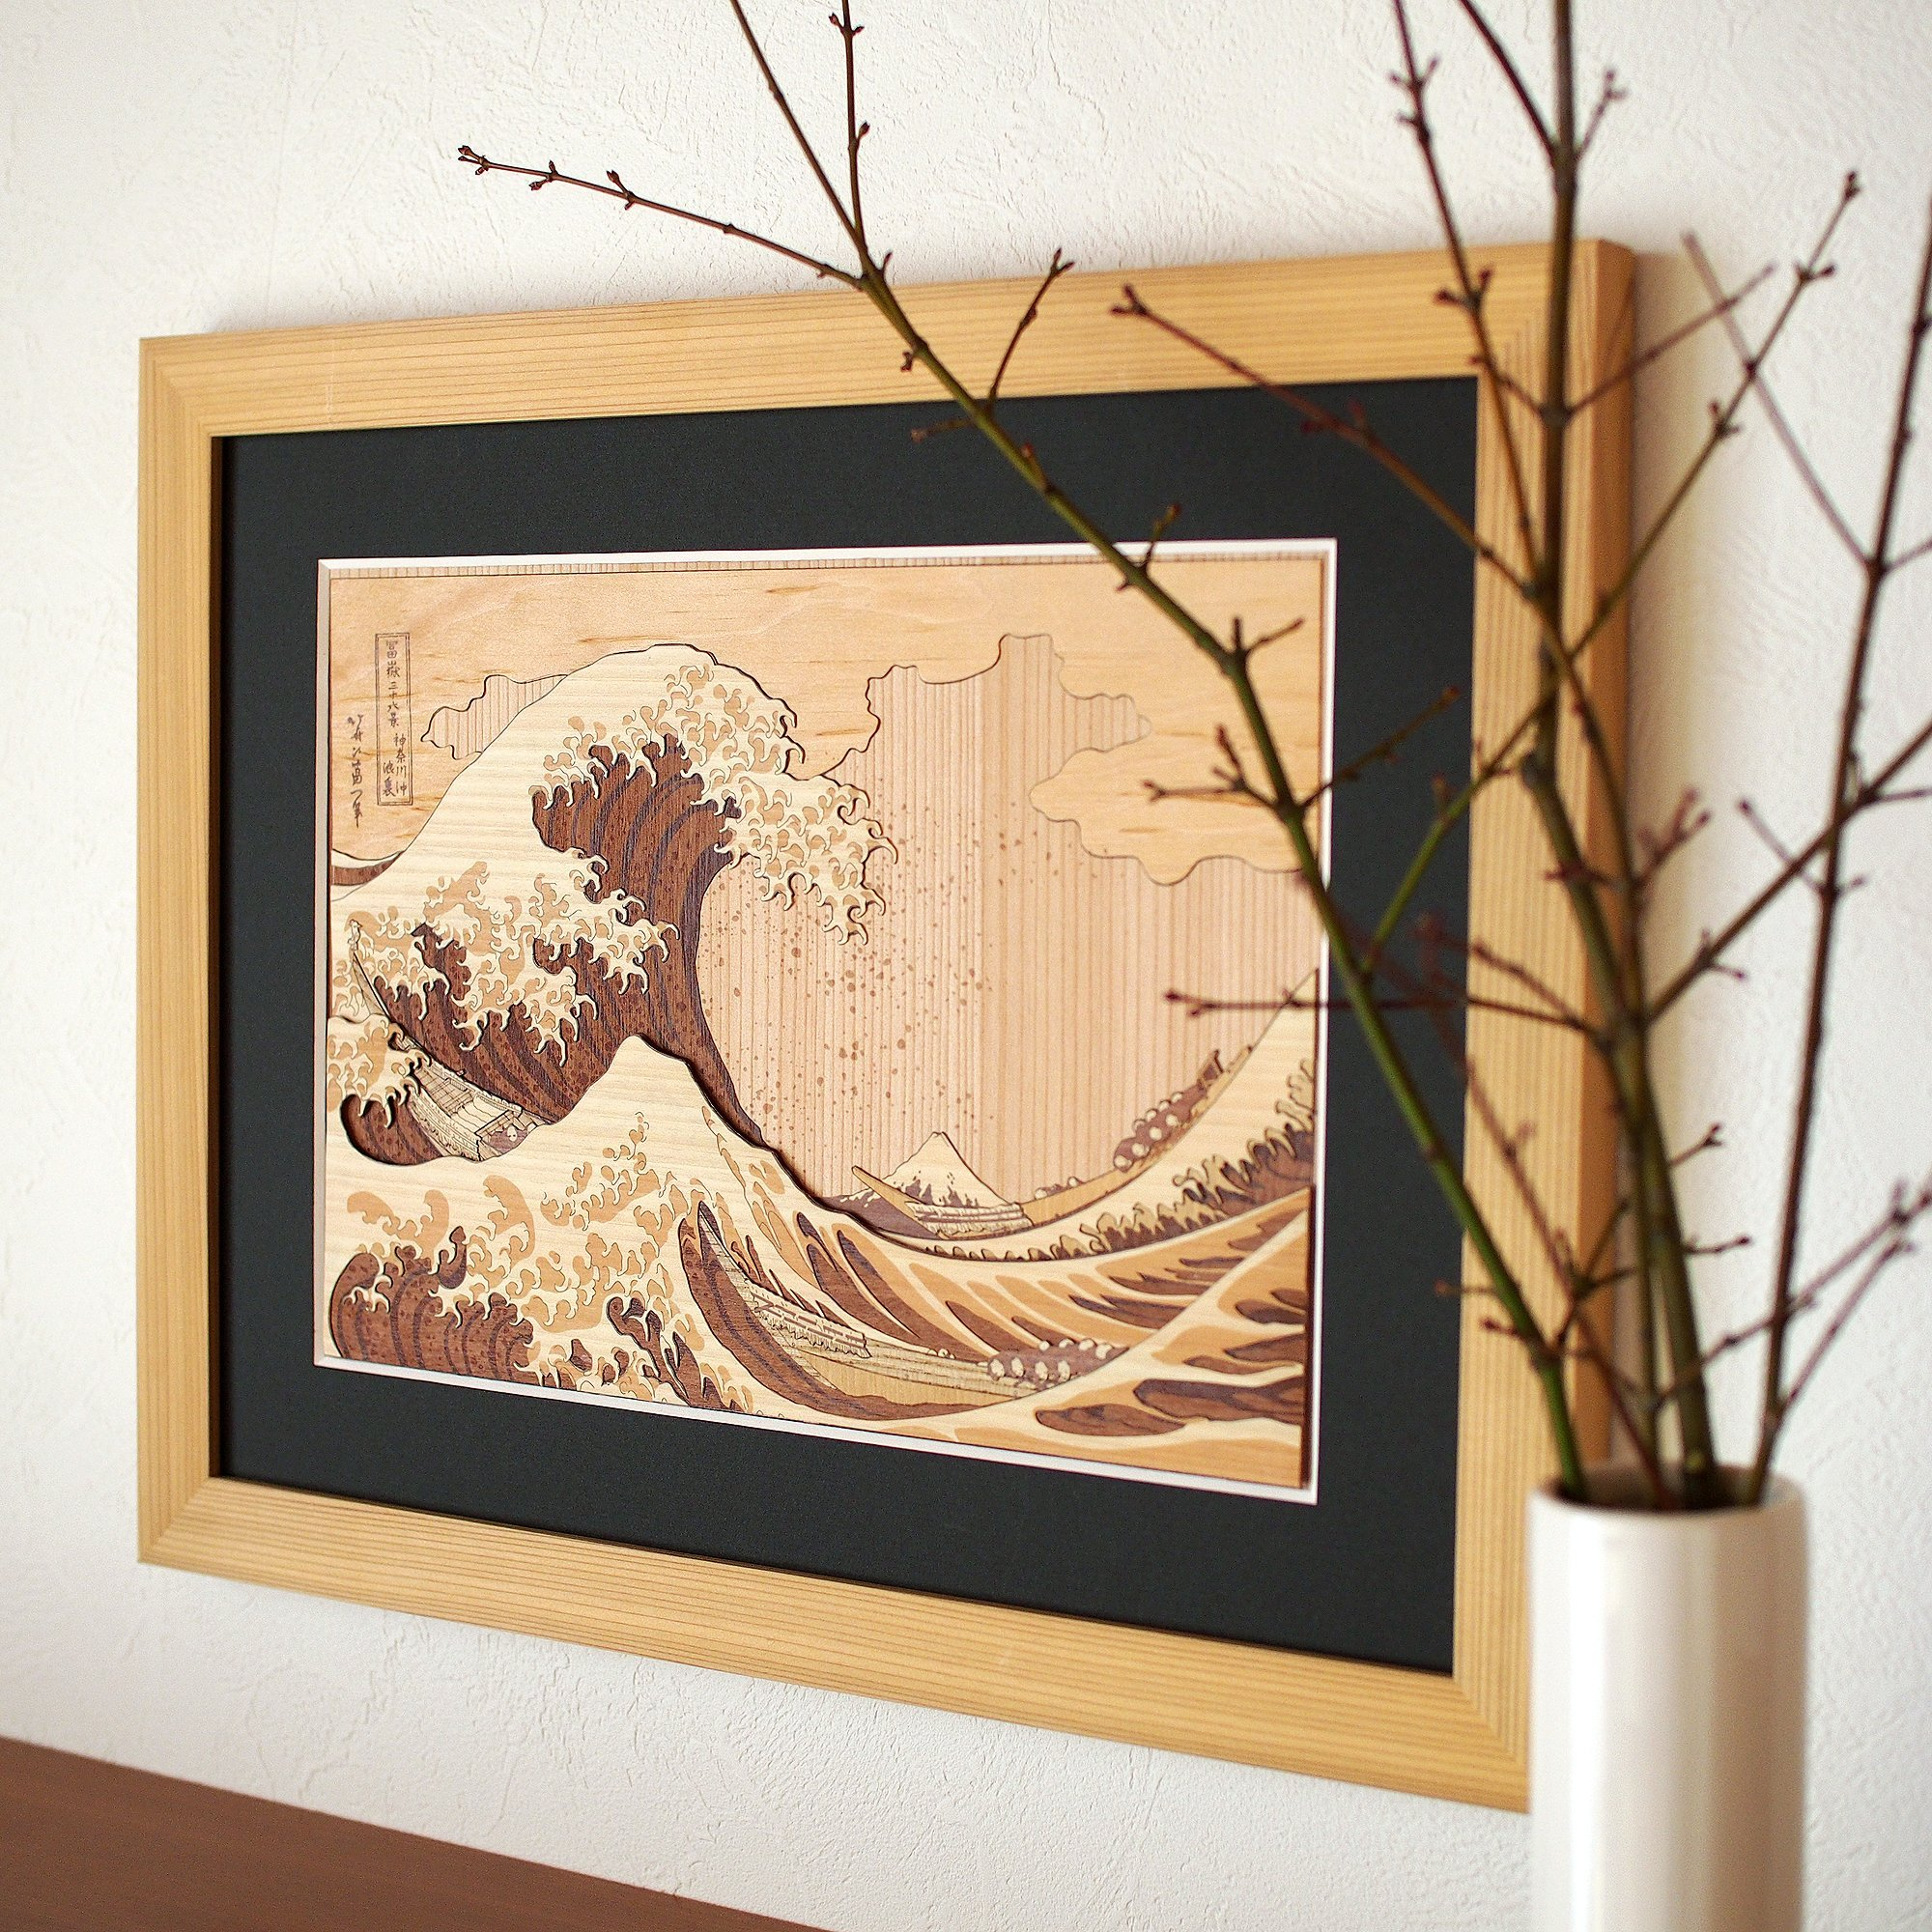 KINOWA Ukiyoe Art Kit Kiharie The Great Wave Off Kanagawa Thirty-six Views of Mount Fuji by Hokusai Made in Japan by KINOWA (Image #9)